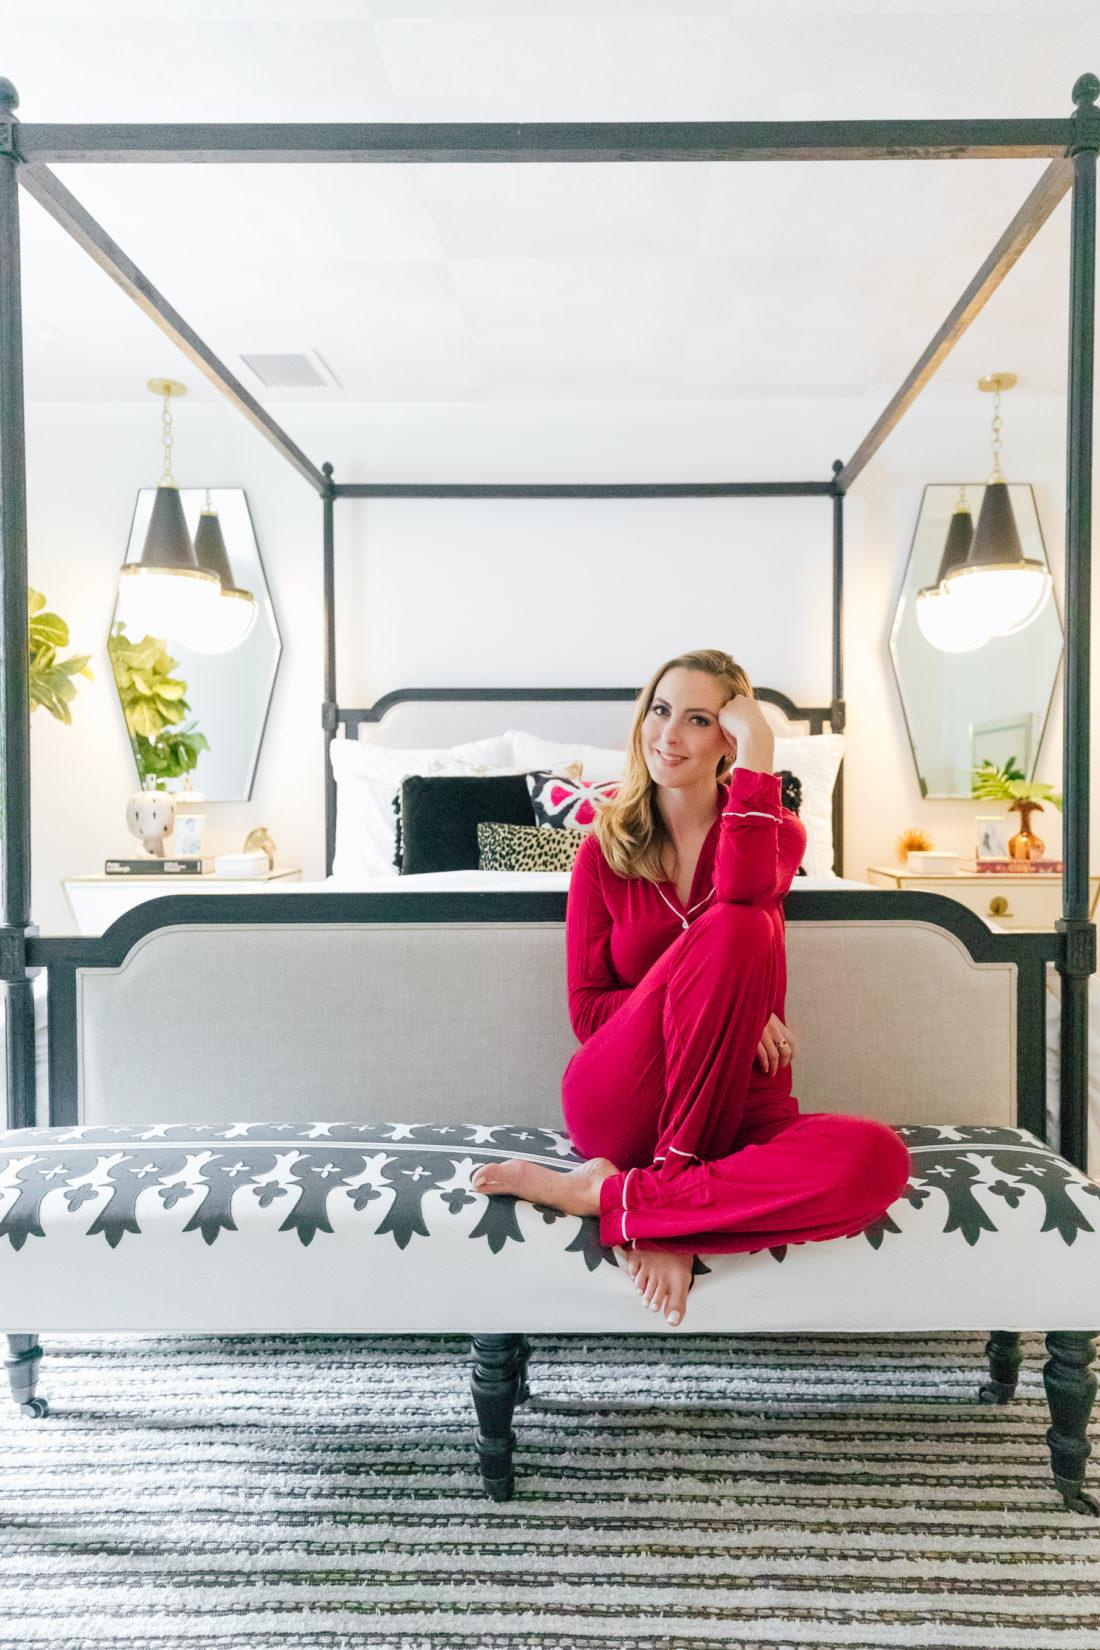 Eva Amurri Martino wears red pajamas while sitting inside her new master bedroom